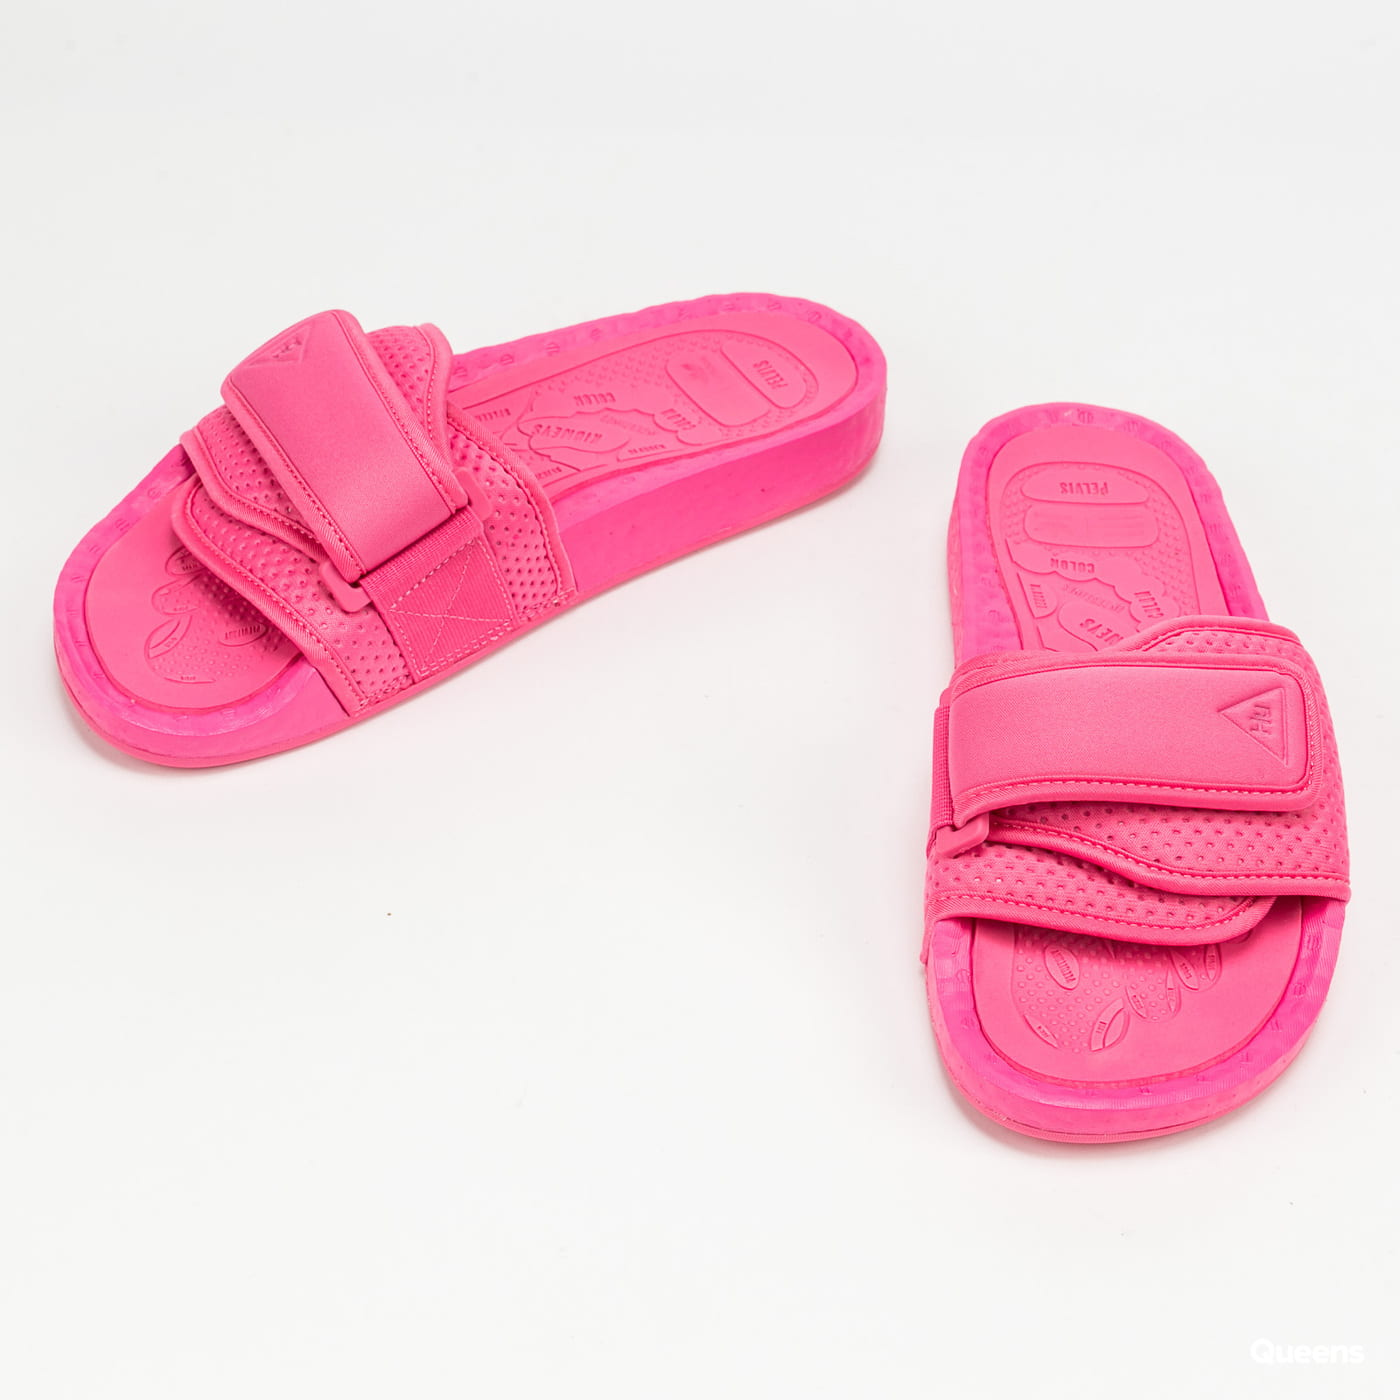 adidas Originals Pharrell Williams Chancletas Hu sesopk / sesopk / sesopk